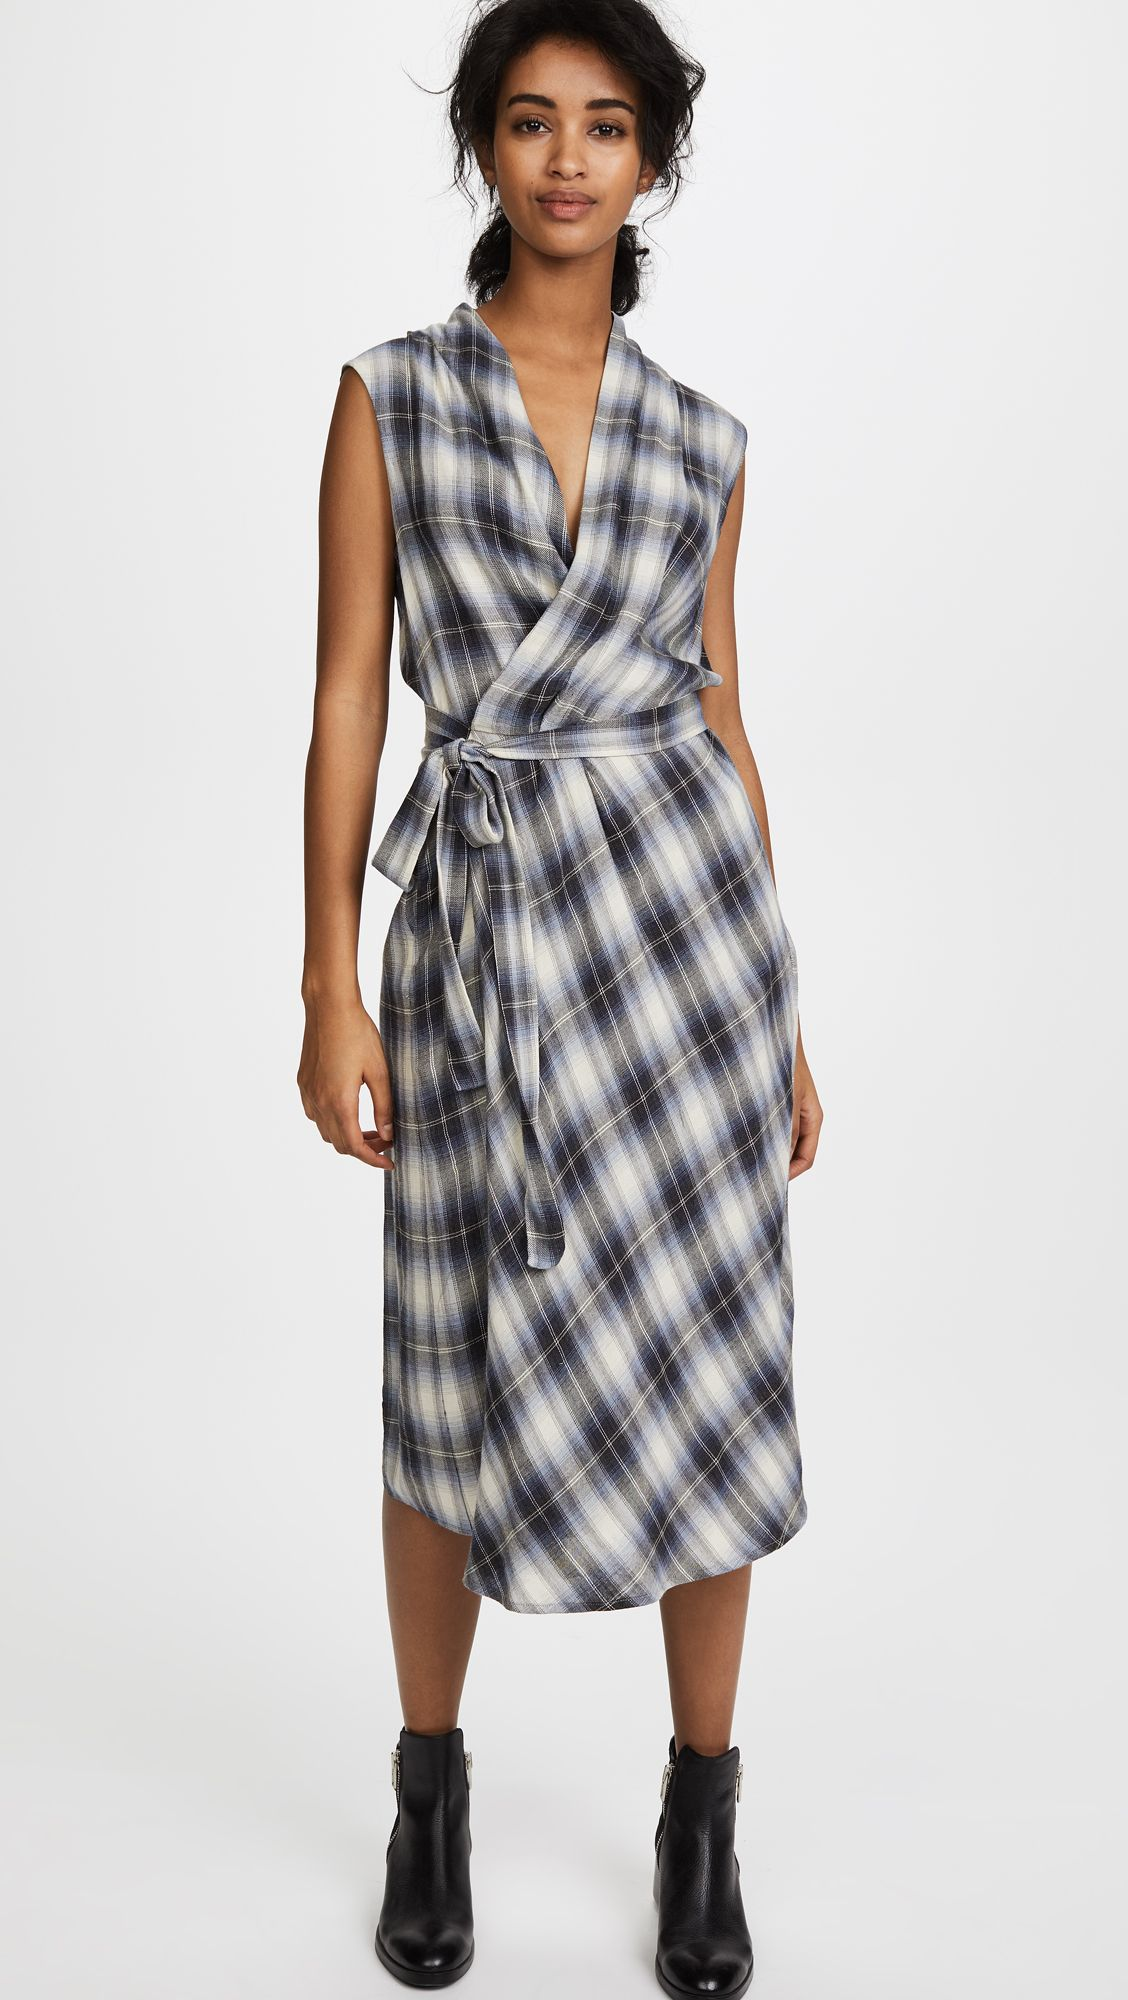 Vince Shadow Plaid Sleeveless Wrap Dress Shopbop Sleeveless Wrap Dress Wrap Dress Dresses [ 2000 x 1128 Pixel ]